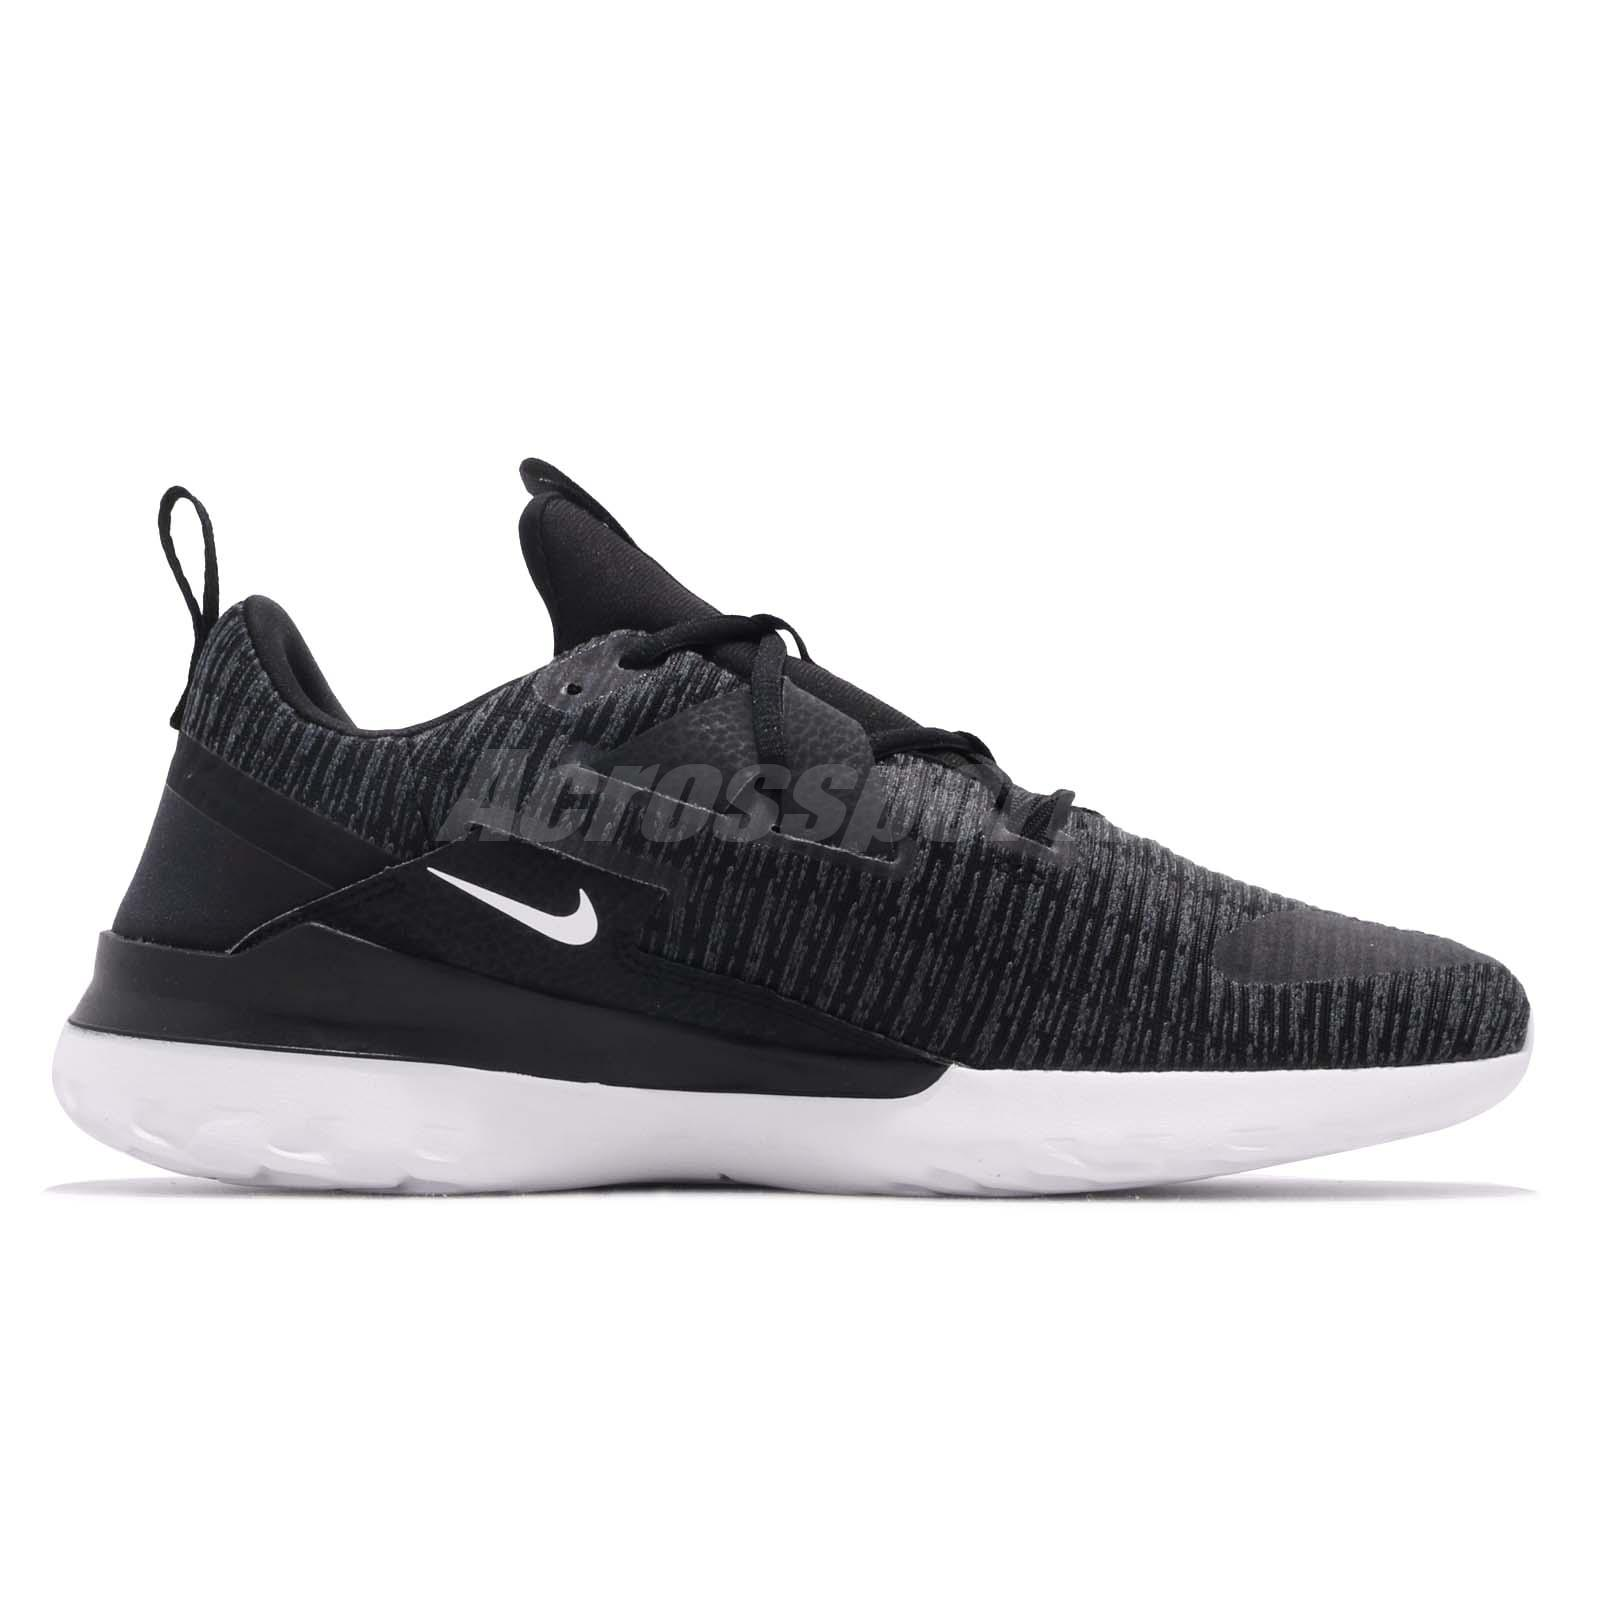 Forzado Compasión Desbordamiento  Nike Renew Arena Black White Men Running Casual Shoes Sneakers AJ5903-001 |  eBay